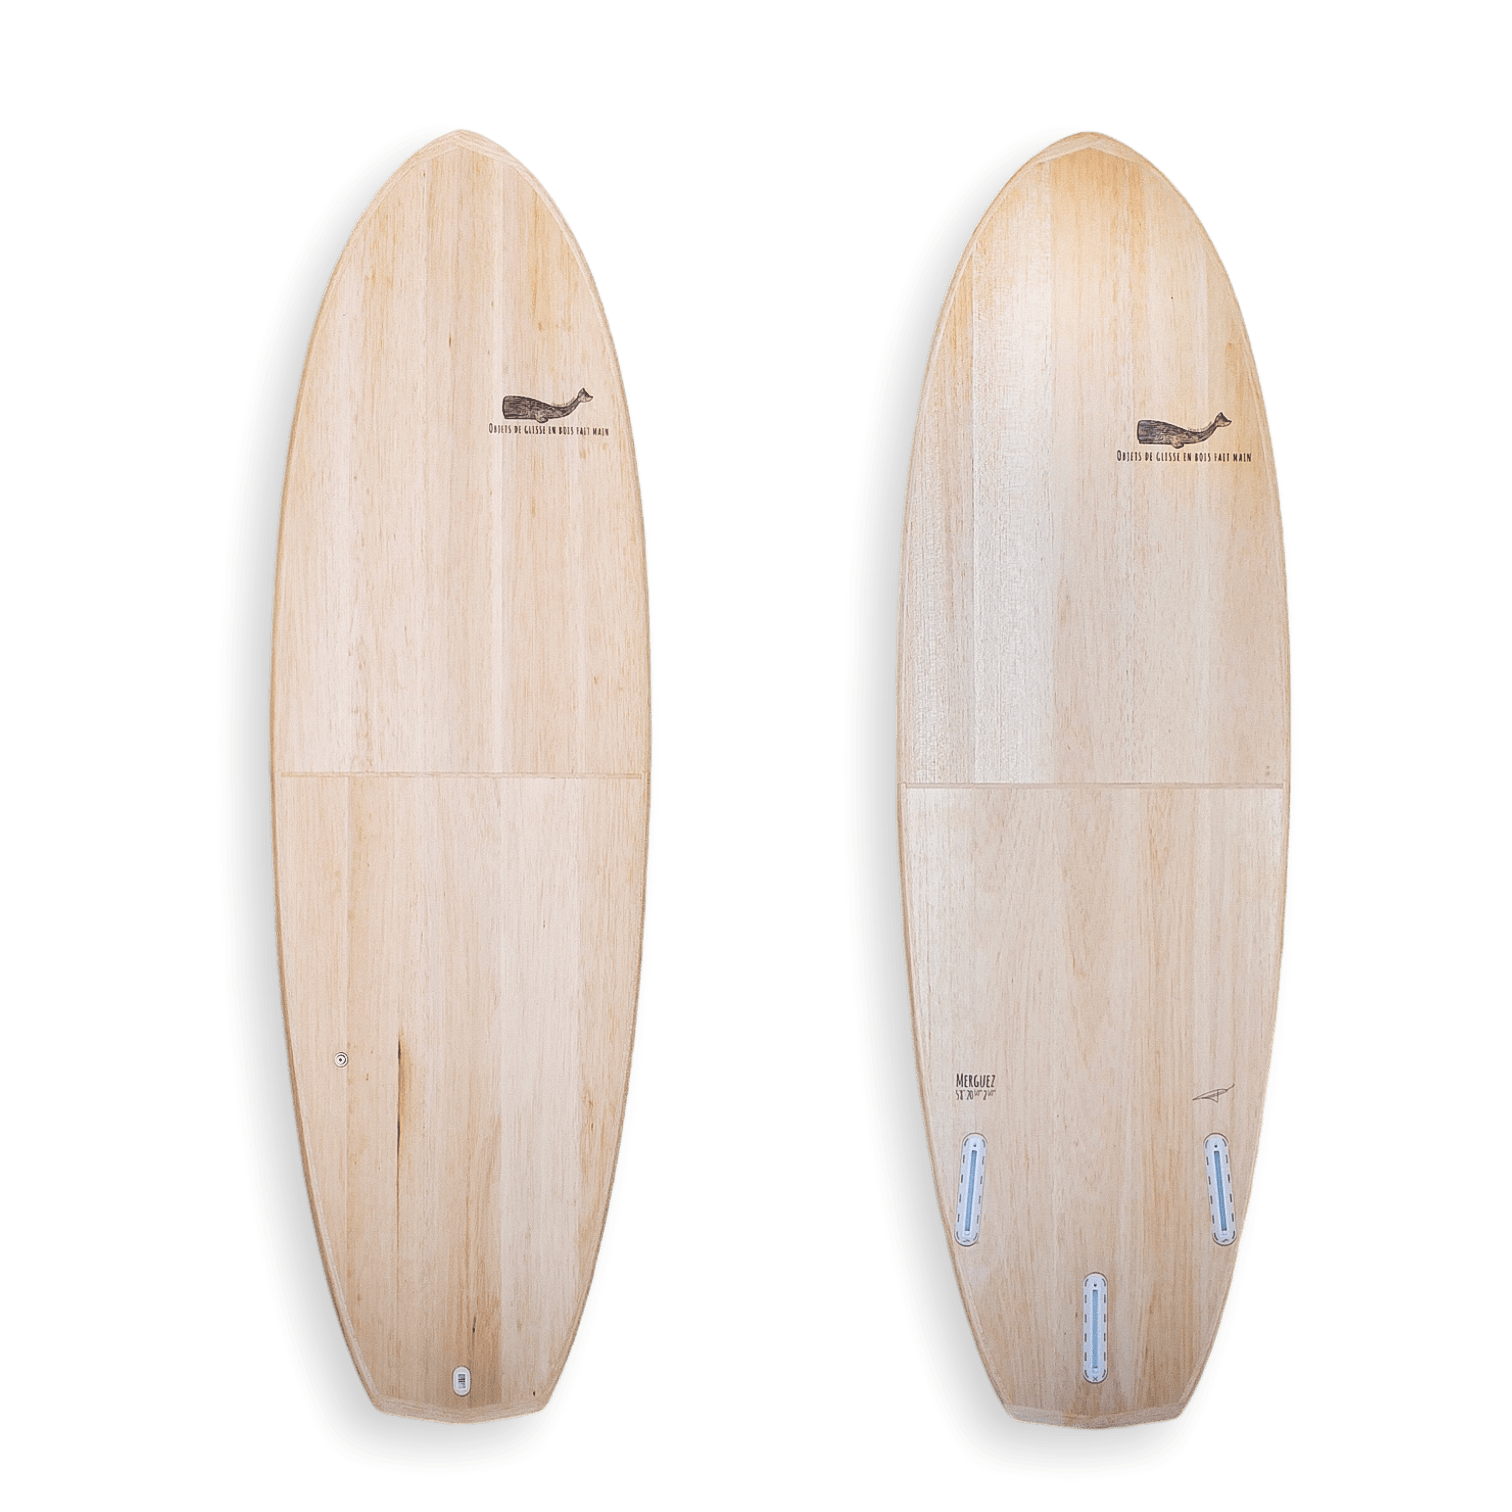 Cachalot Surfboards planche surf handmade artisan shaper quiver merguez